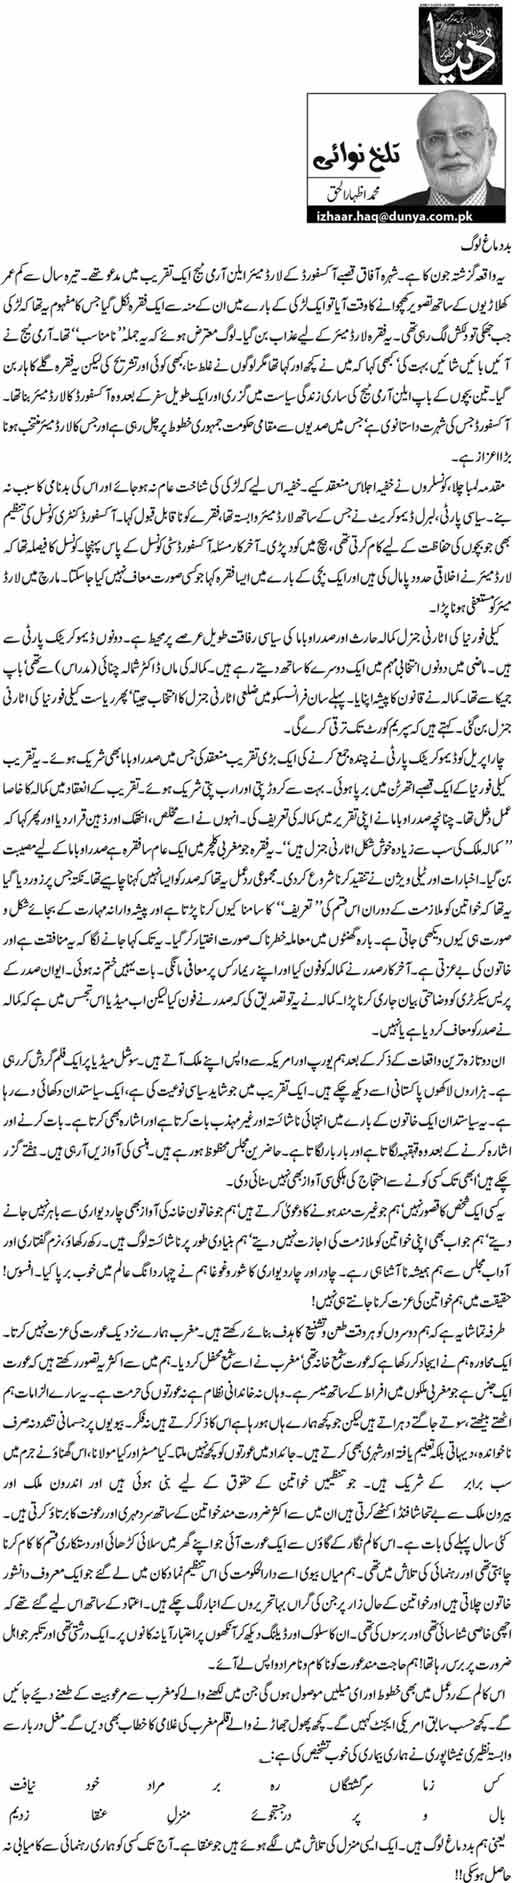 Bad Demagh Log - M. Izhar ul Haq